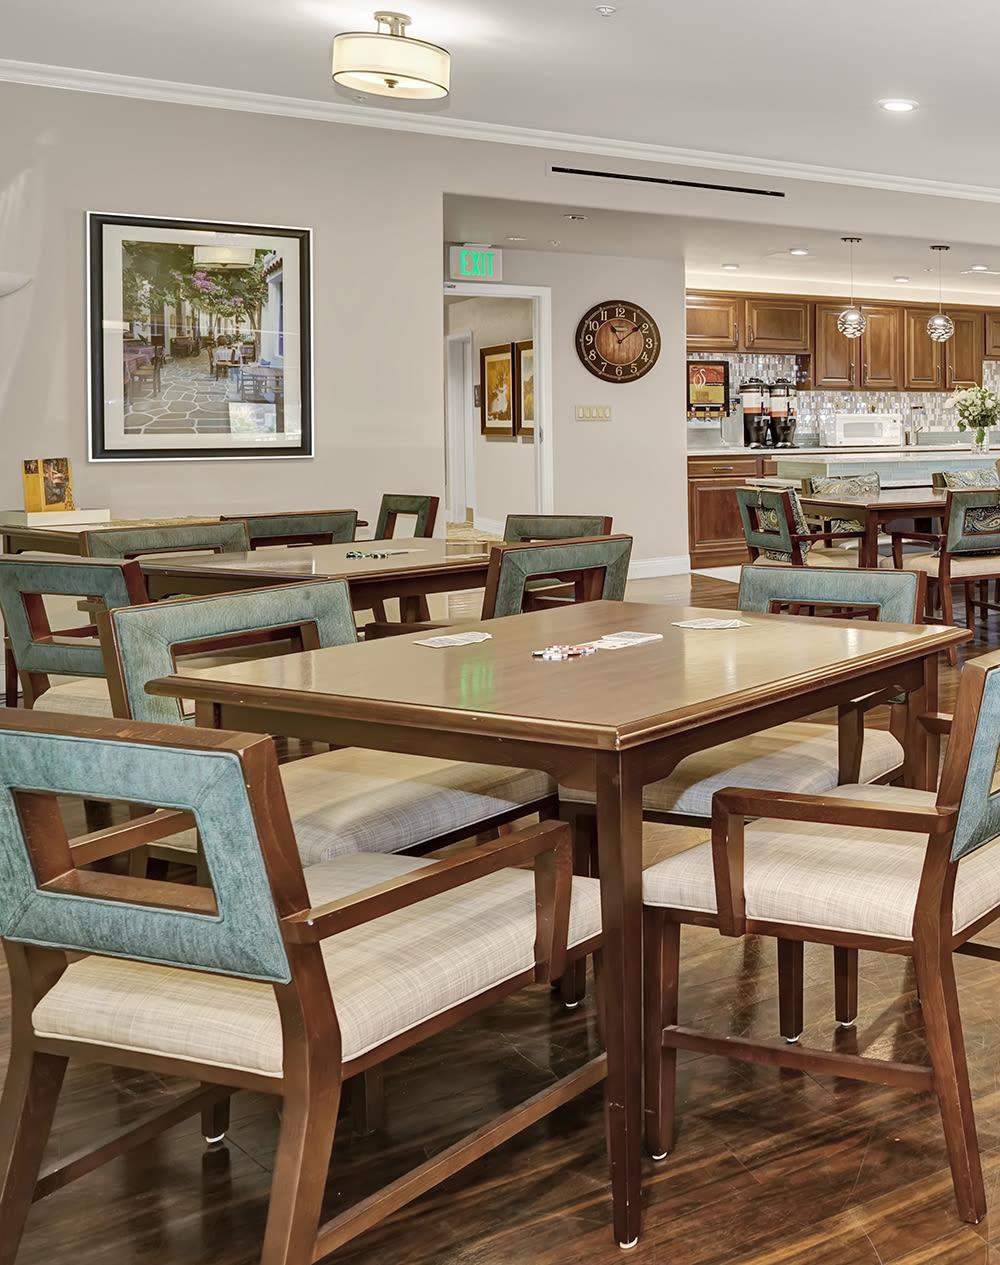 Dining table at The Palisades at Broadmoor Park in Colorado Springs, Colorado